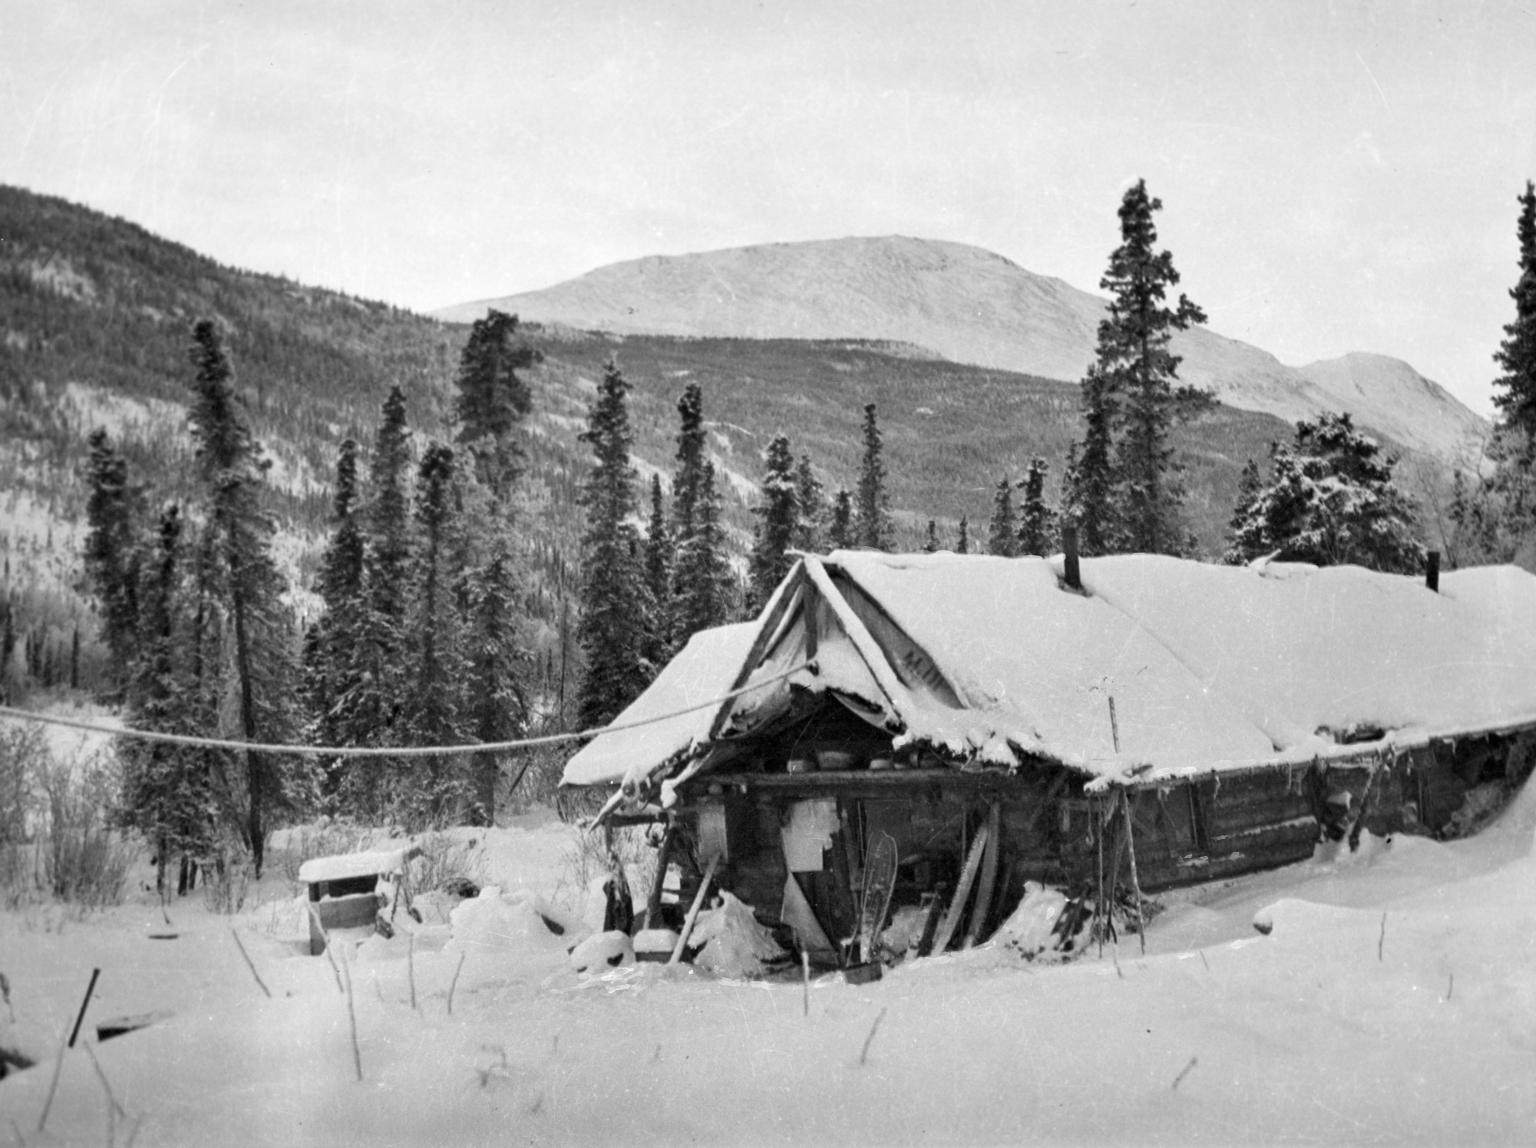 George Bull's Fox Ranch